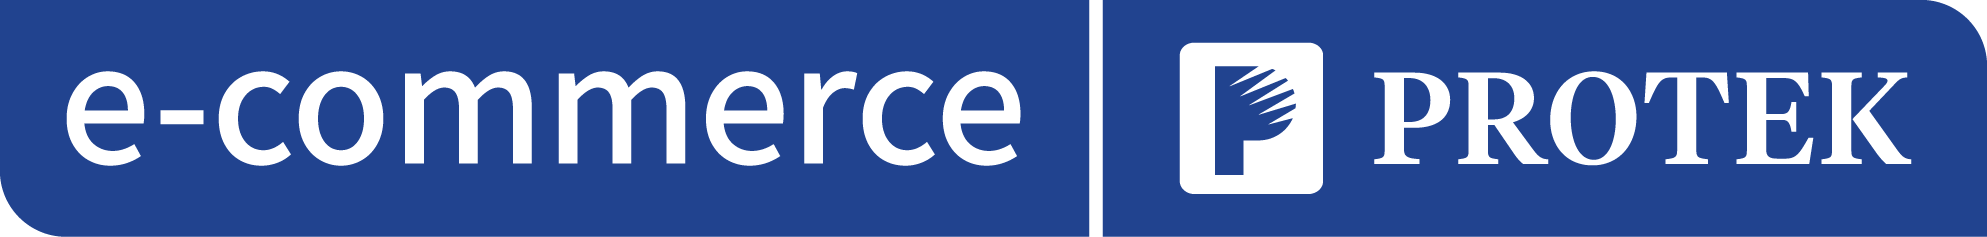 E-Commerce Protek